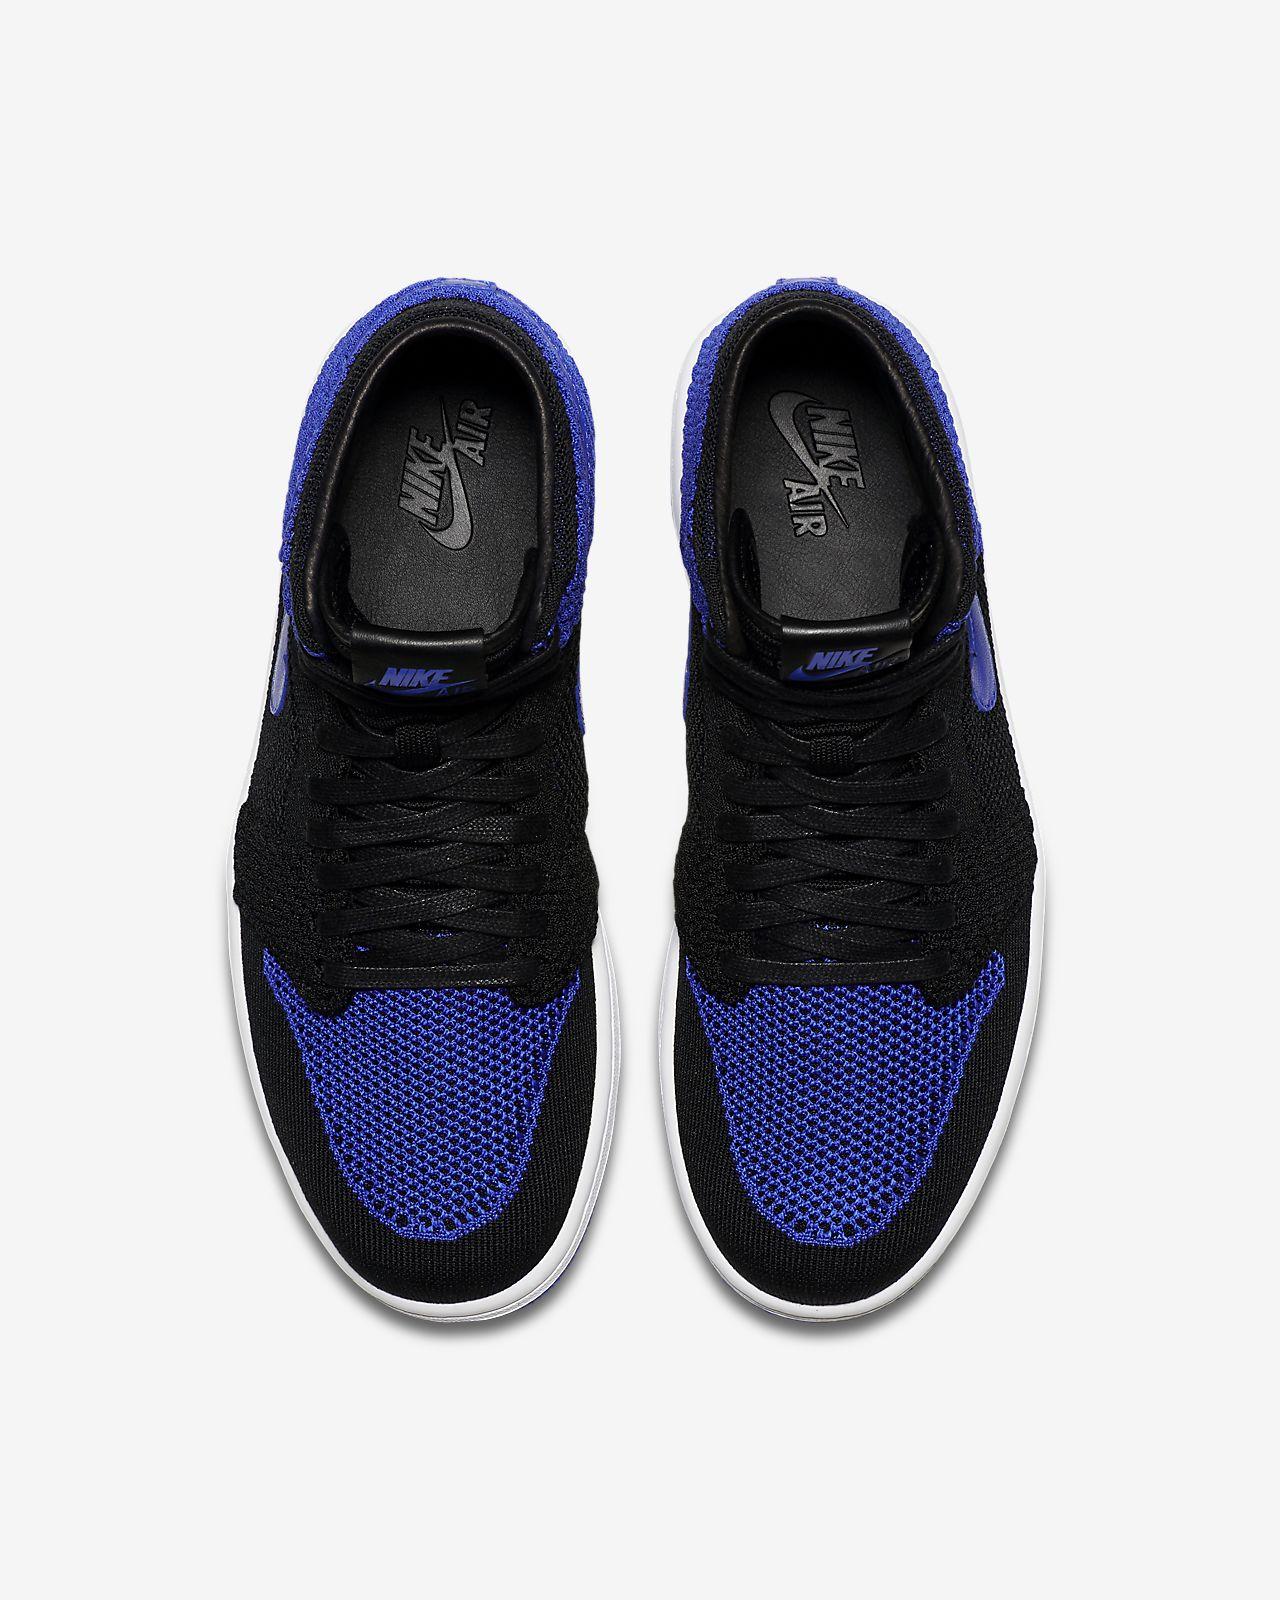 84395b67 Мужские кроссовки Air Jordan 1 Retro High Flyknit. Nike.com RU